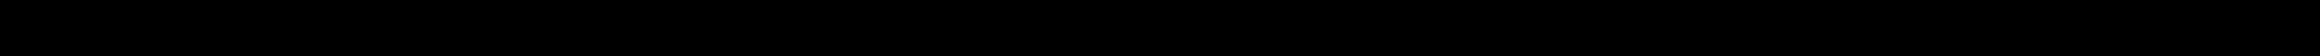 RIDEX 901 421 03 12, 9014210612, 902 421 03 12, 902 421 04 12, 902 421 06 12 Tarcza hamulcowa